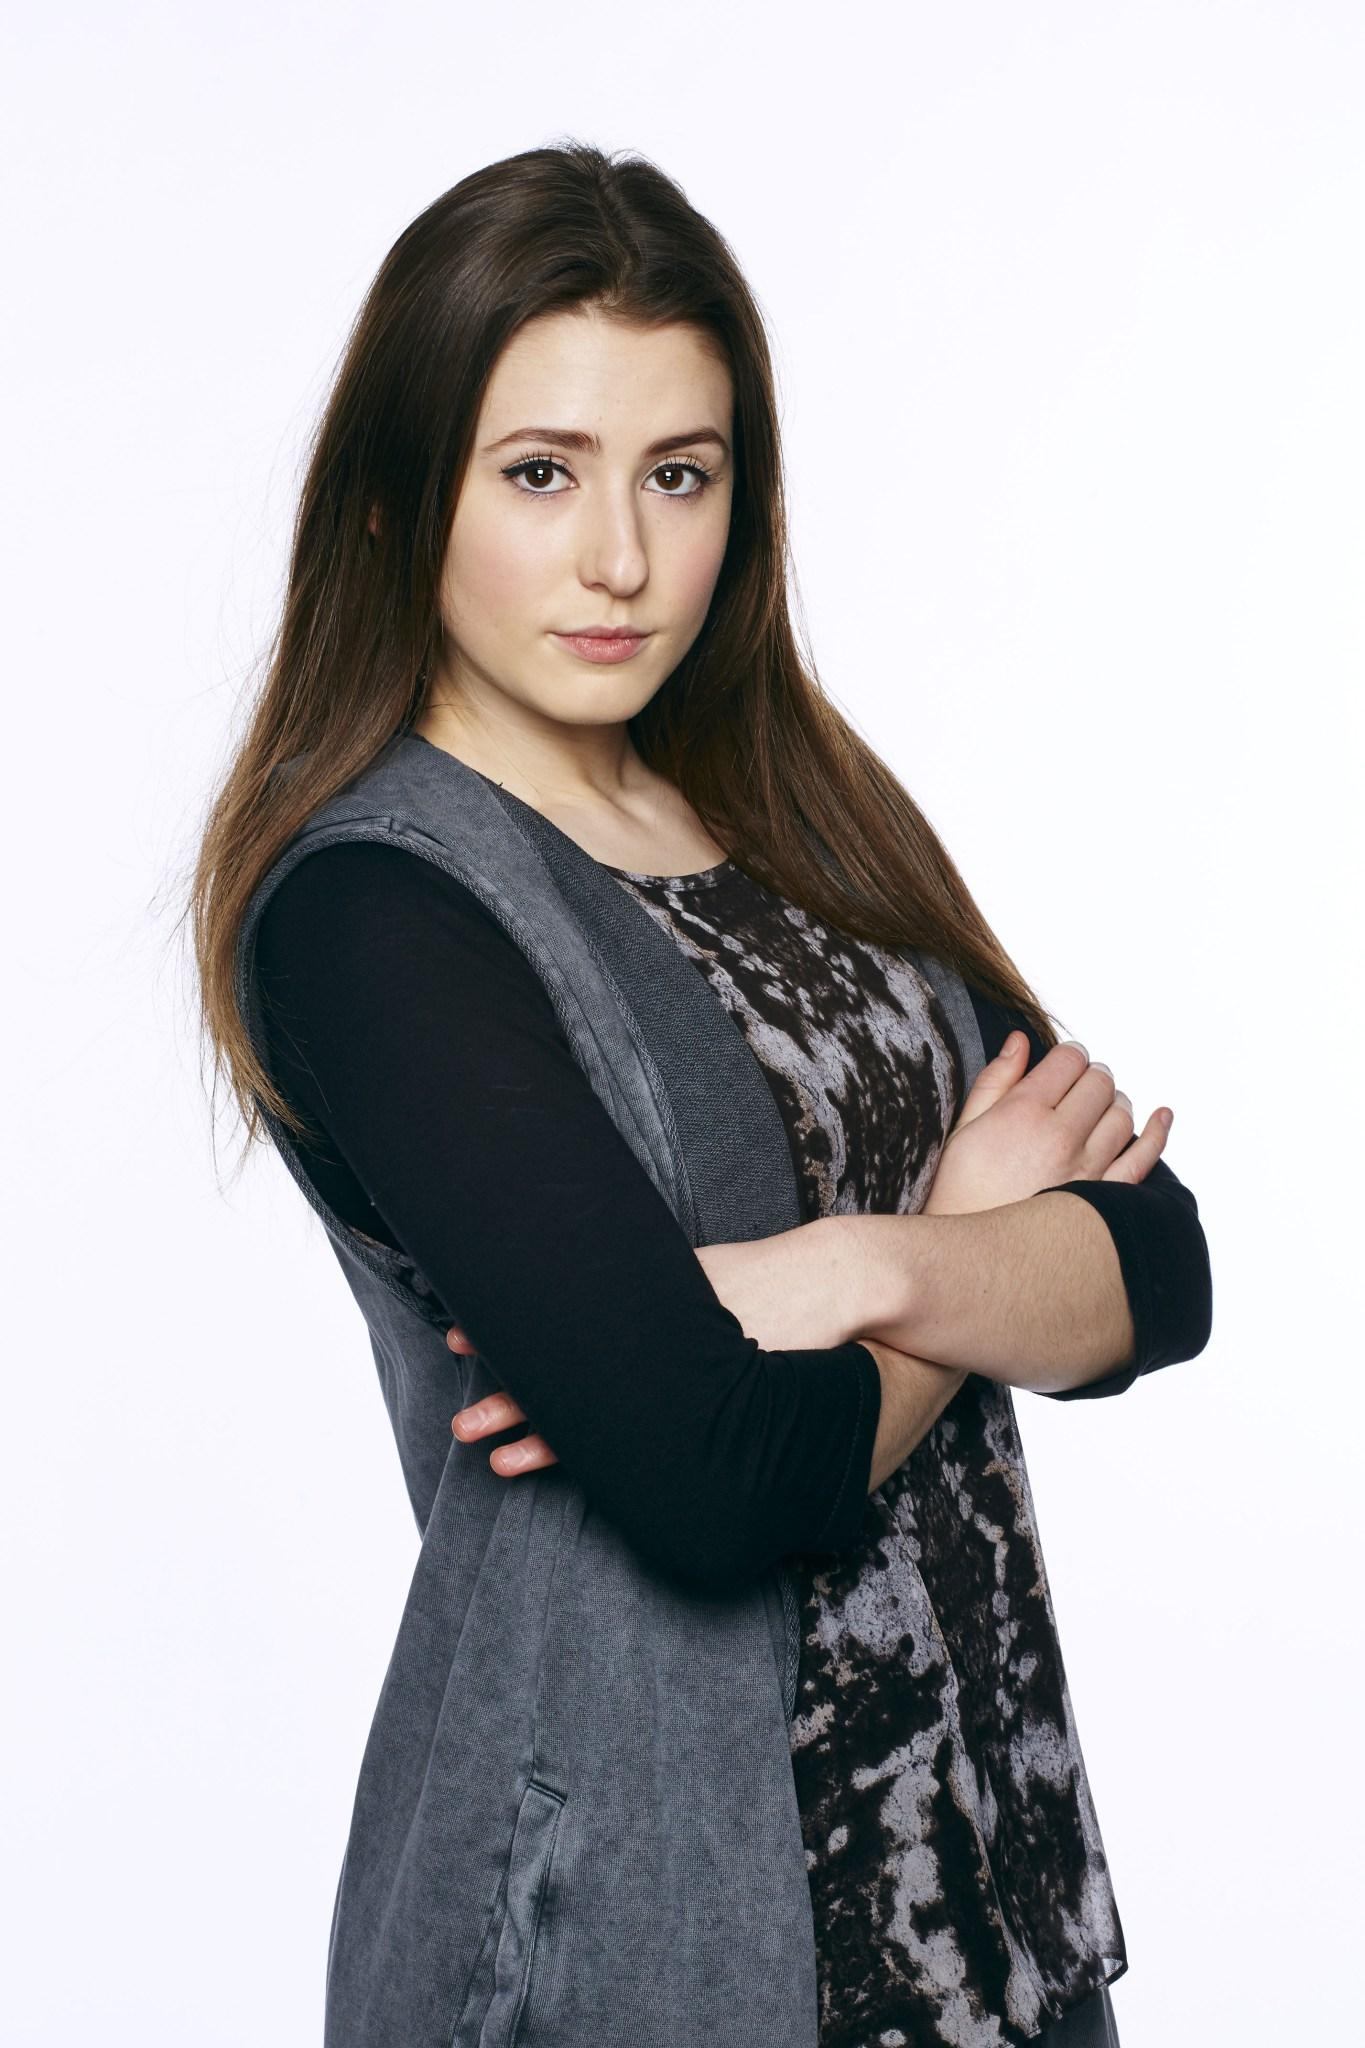 Jasmine Armfield